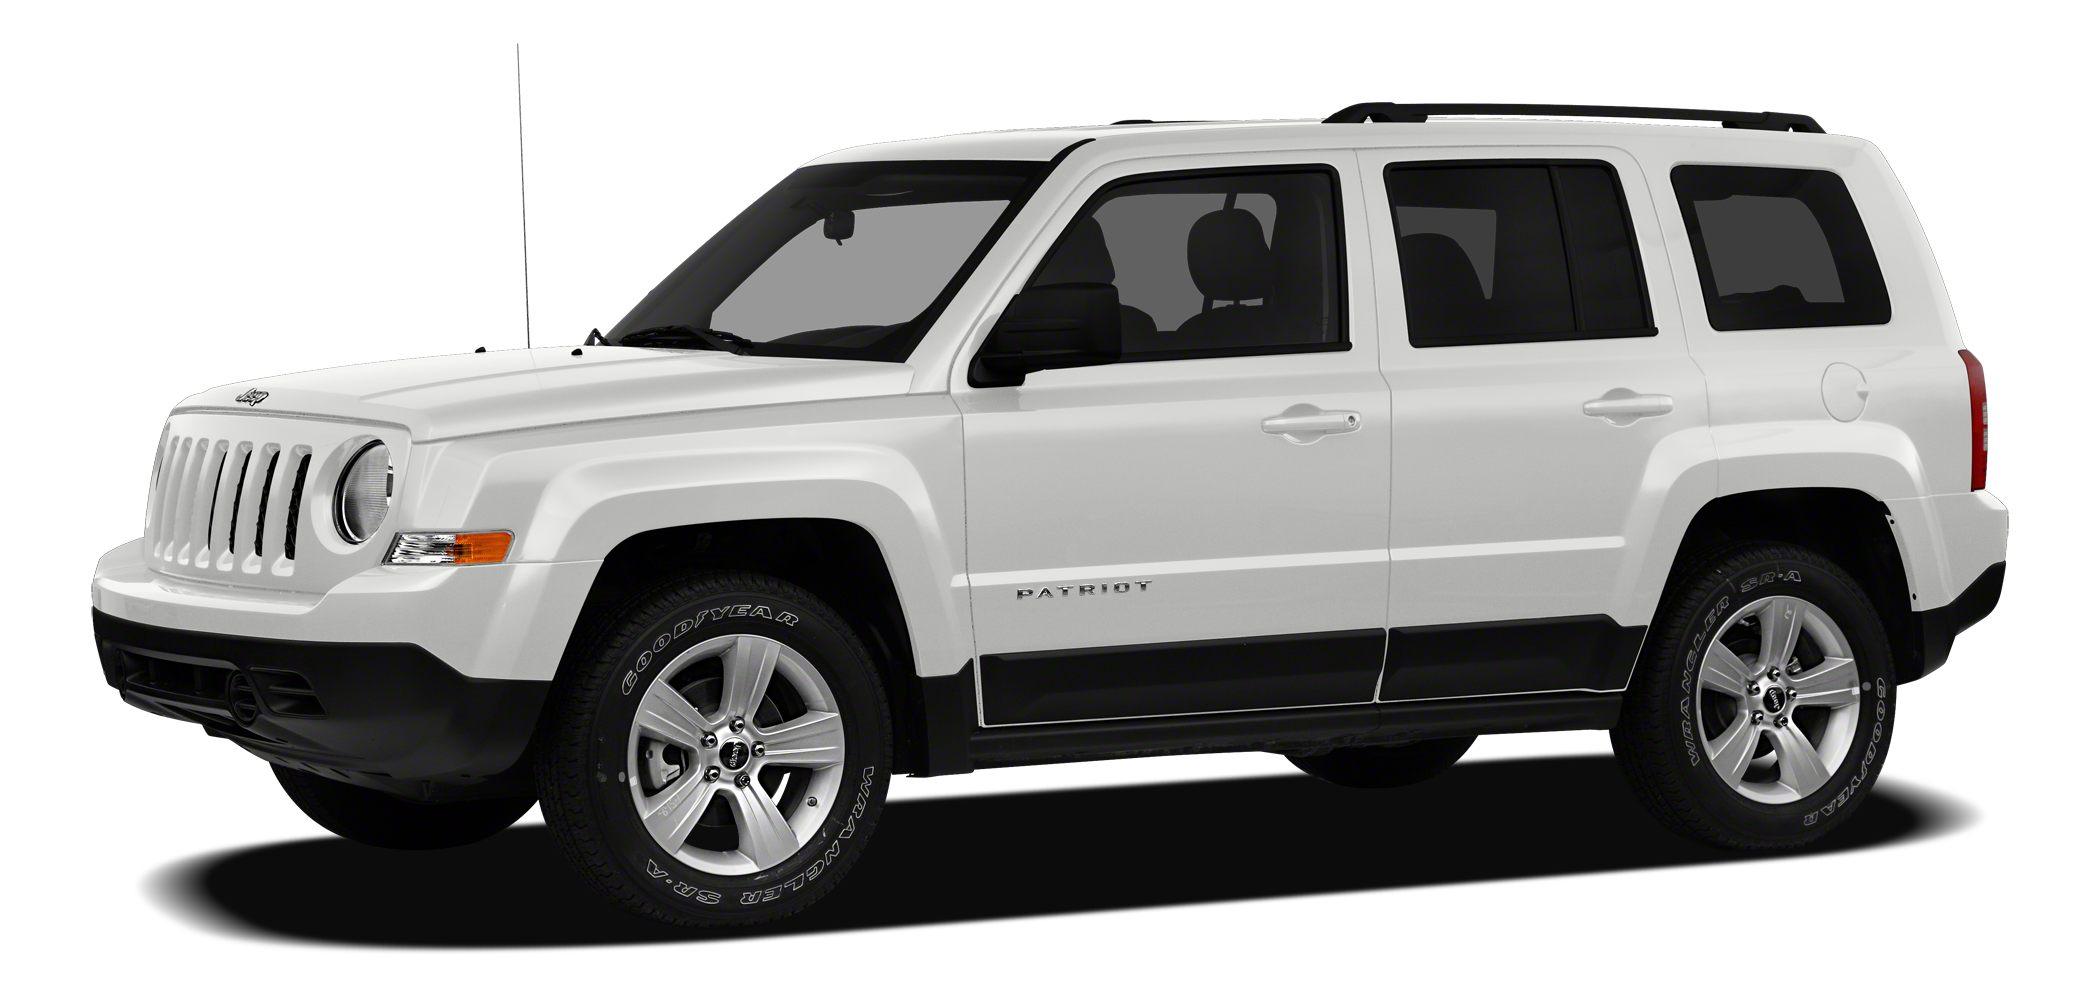 2012 Jeep Patriot Latitude Clean Carfax - One Owner - 4WD - Alloy Wheels - Heated Seats - Illumina